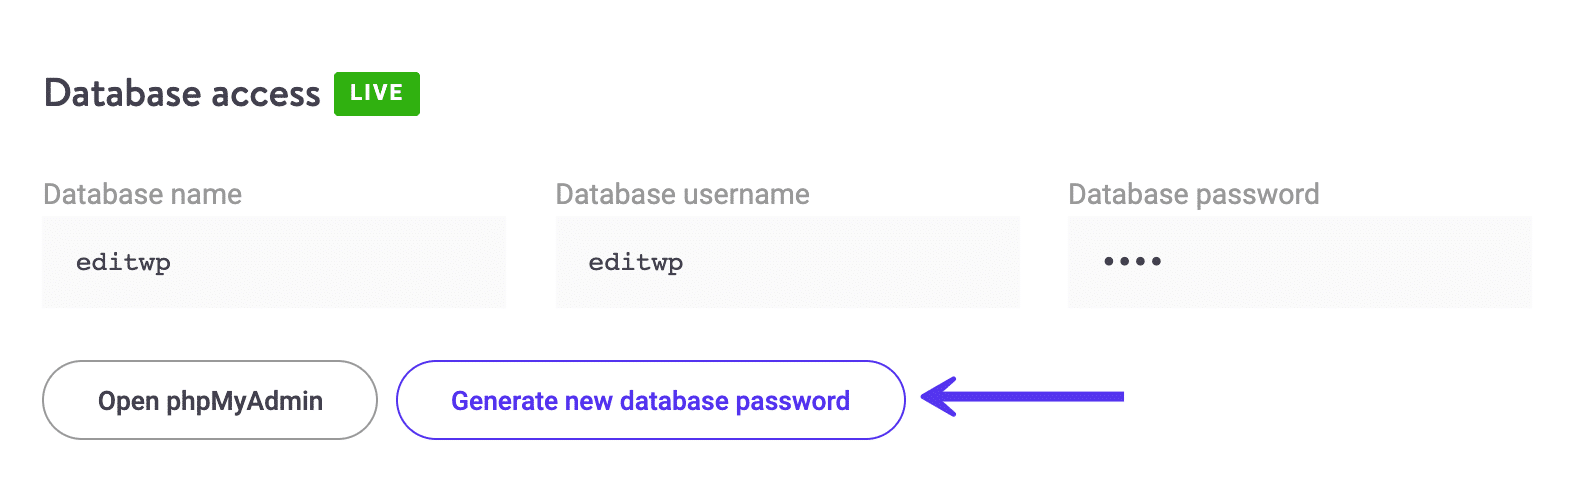 Generare una nuova password del database